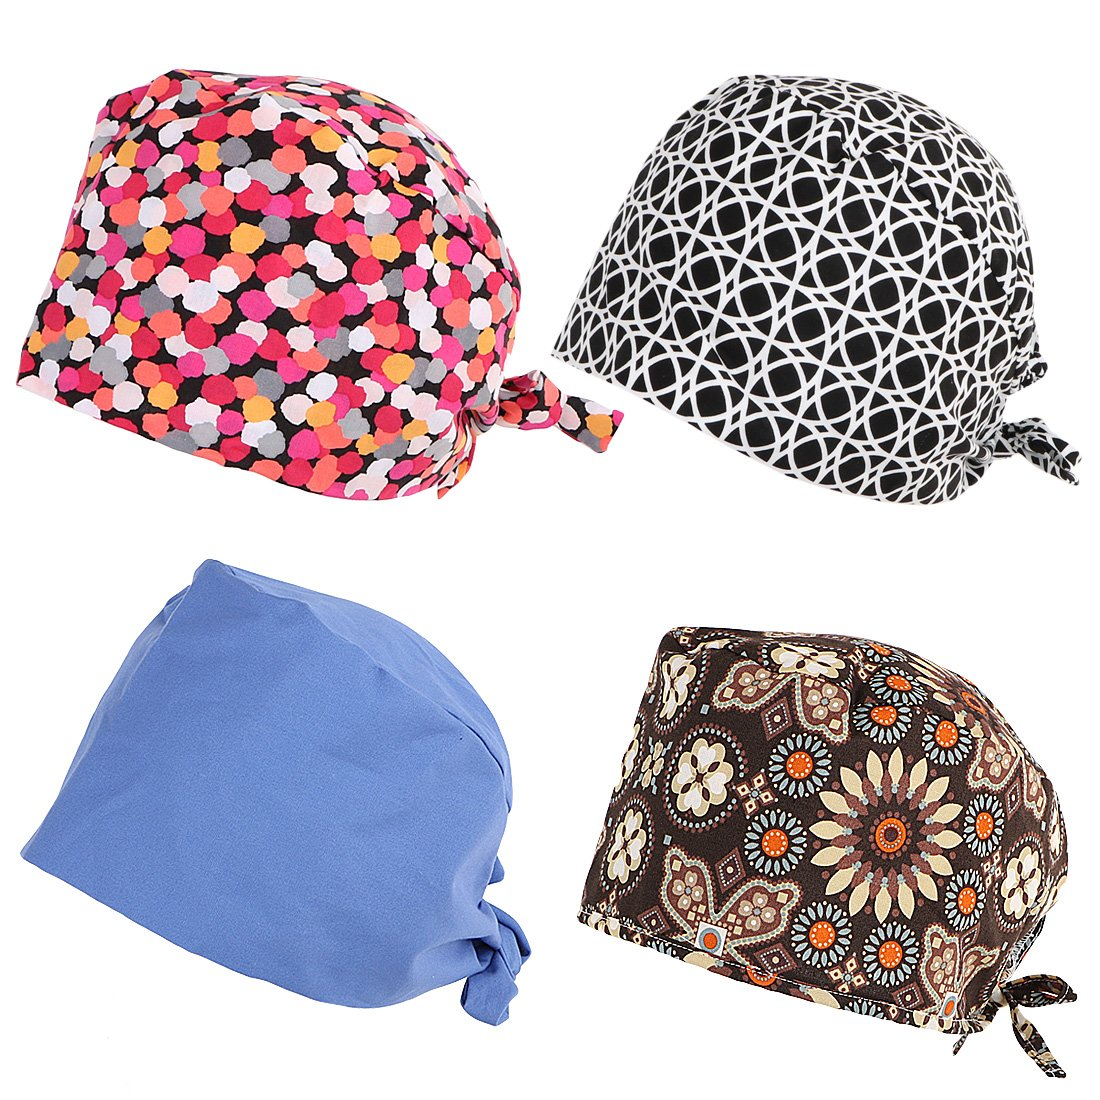 kilofly 4pc Women Men Adjustable Scrub Cap Sweatband Bouffant Hats Value Set by kilofly